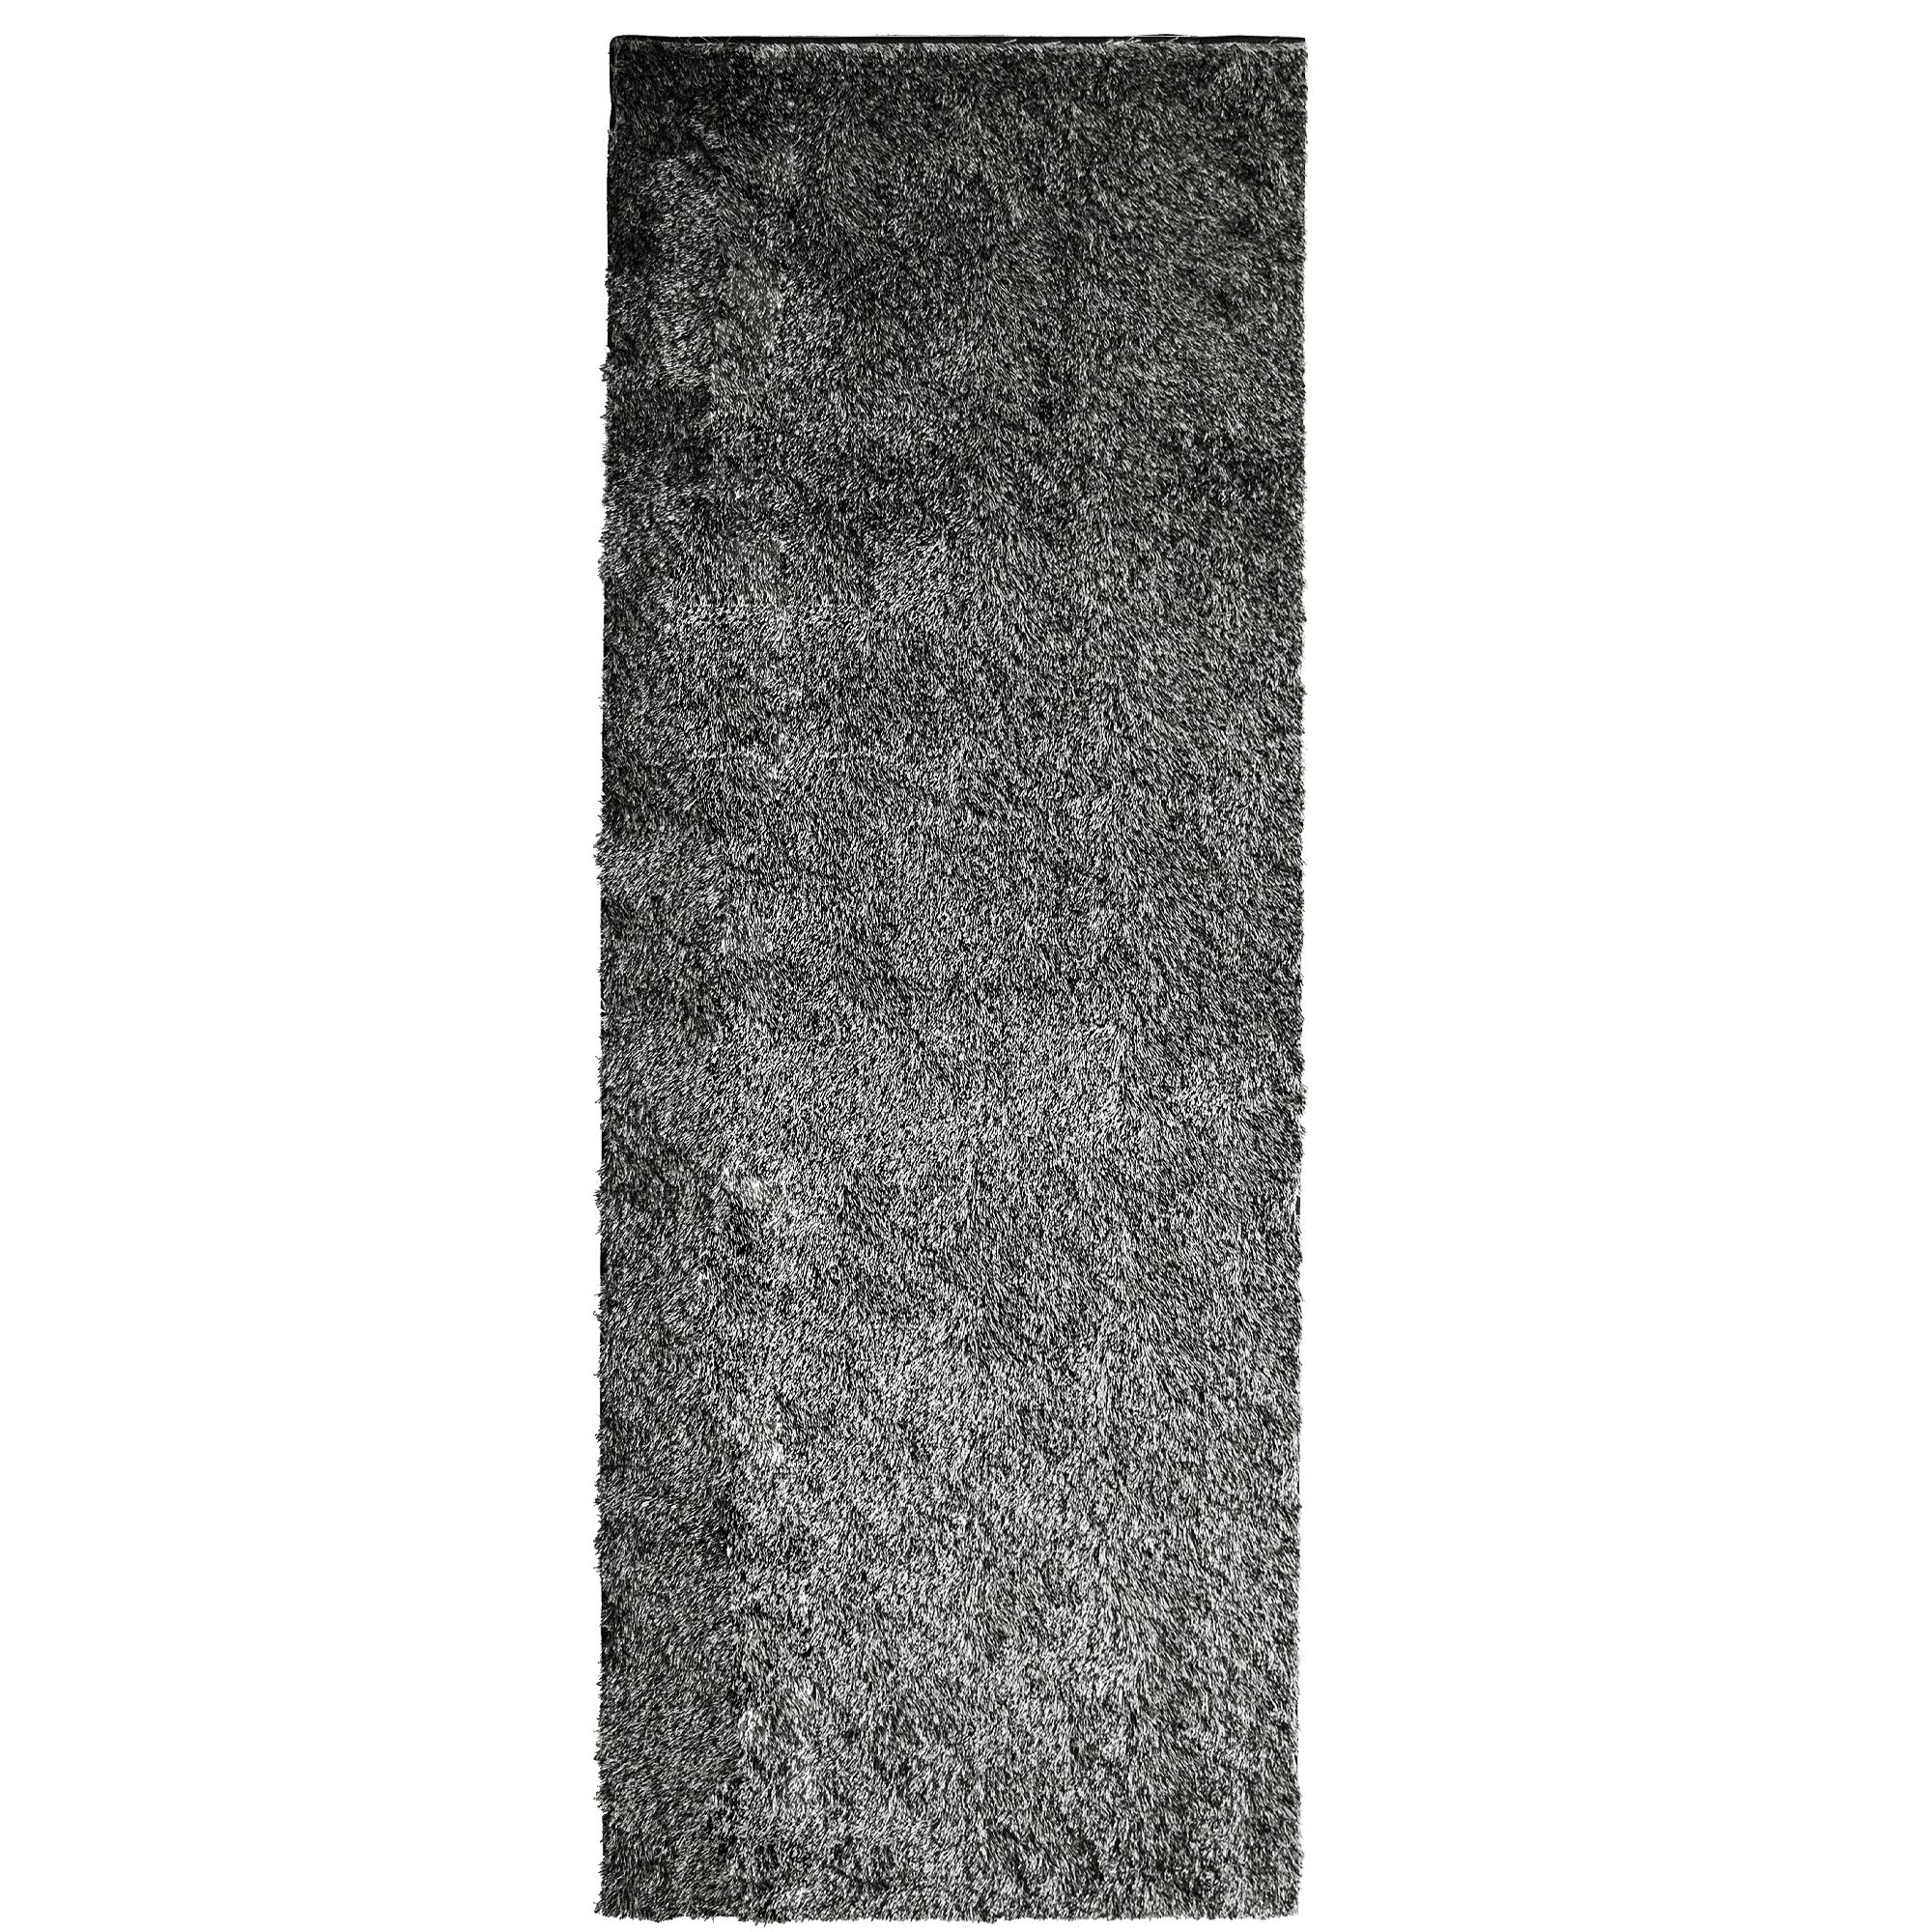 Metro Silk Salt and Pepper Area Rug Rug Size: 5' x 7'6